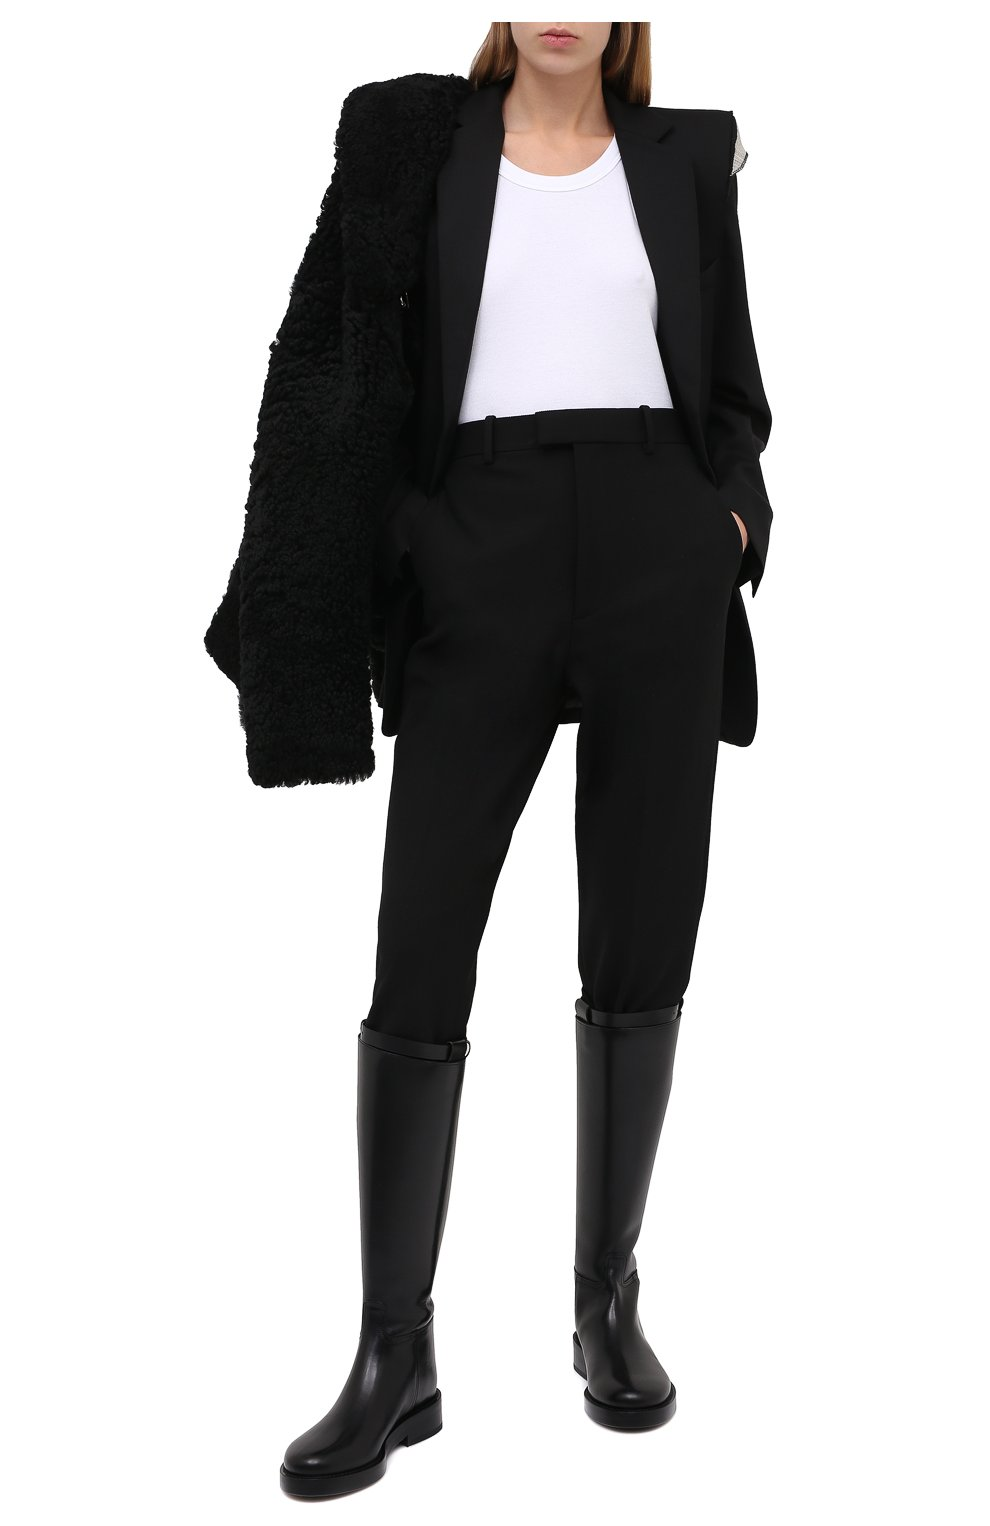 Женские брюки BOTTEGA VENETA черного цвета, арт. 636529/V02W0 | Фото 3